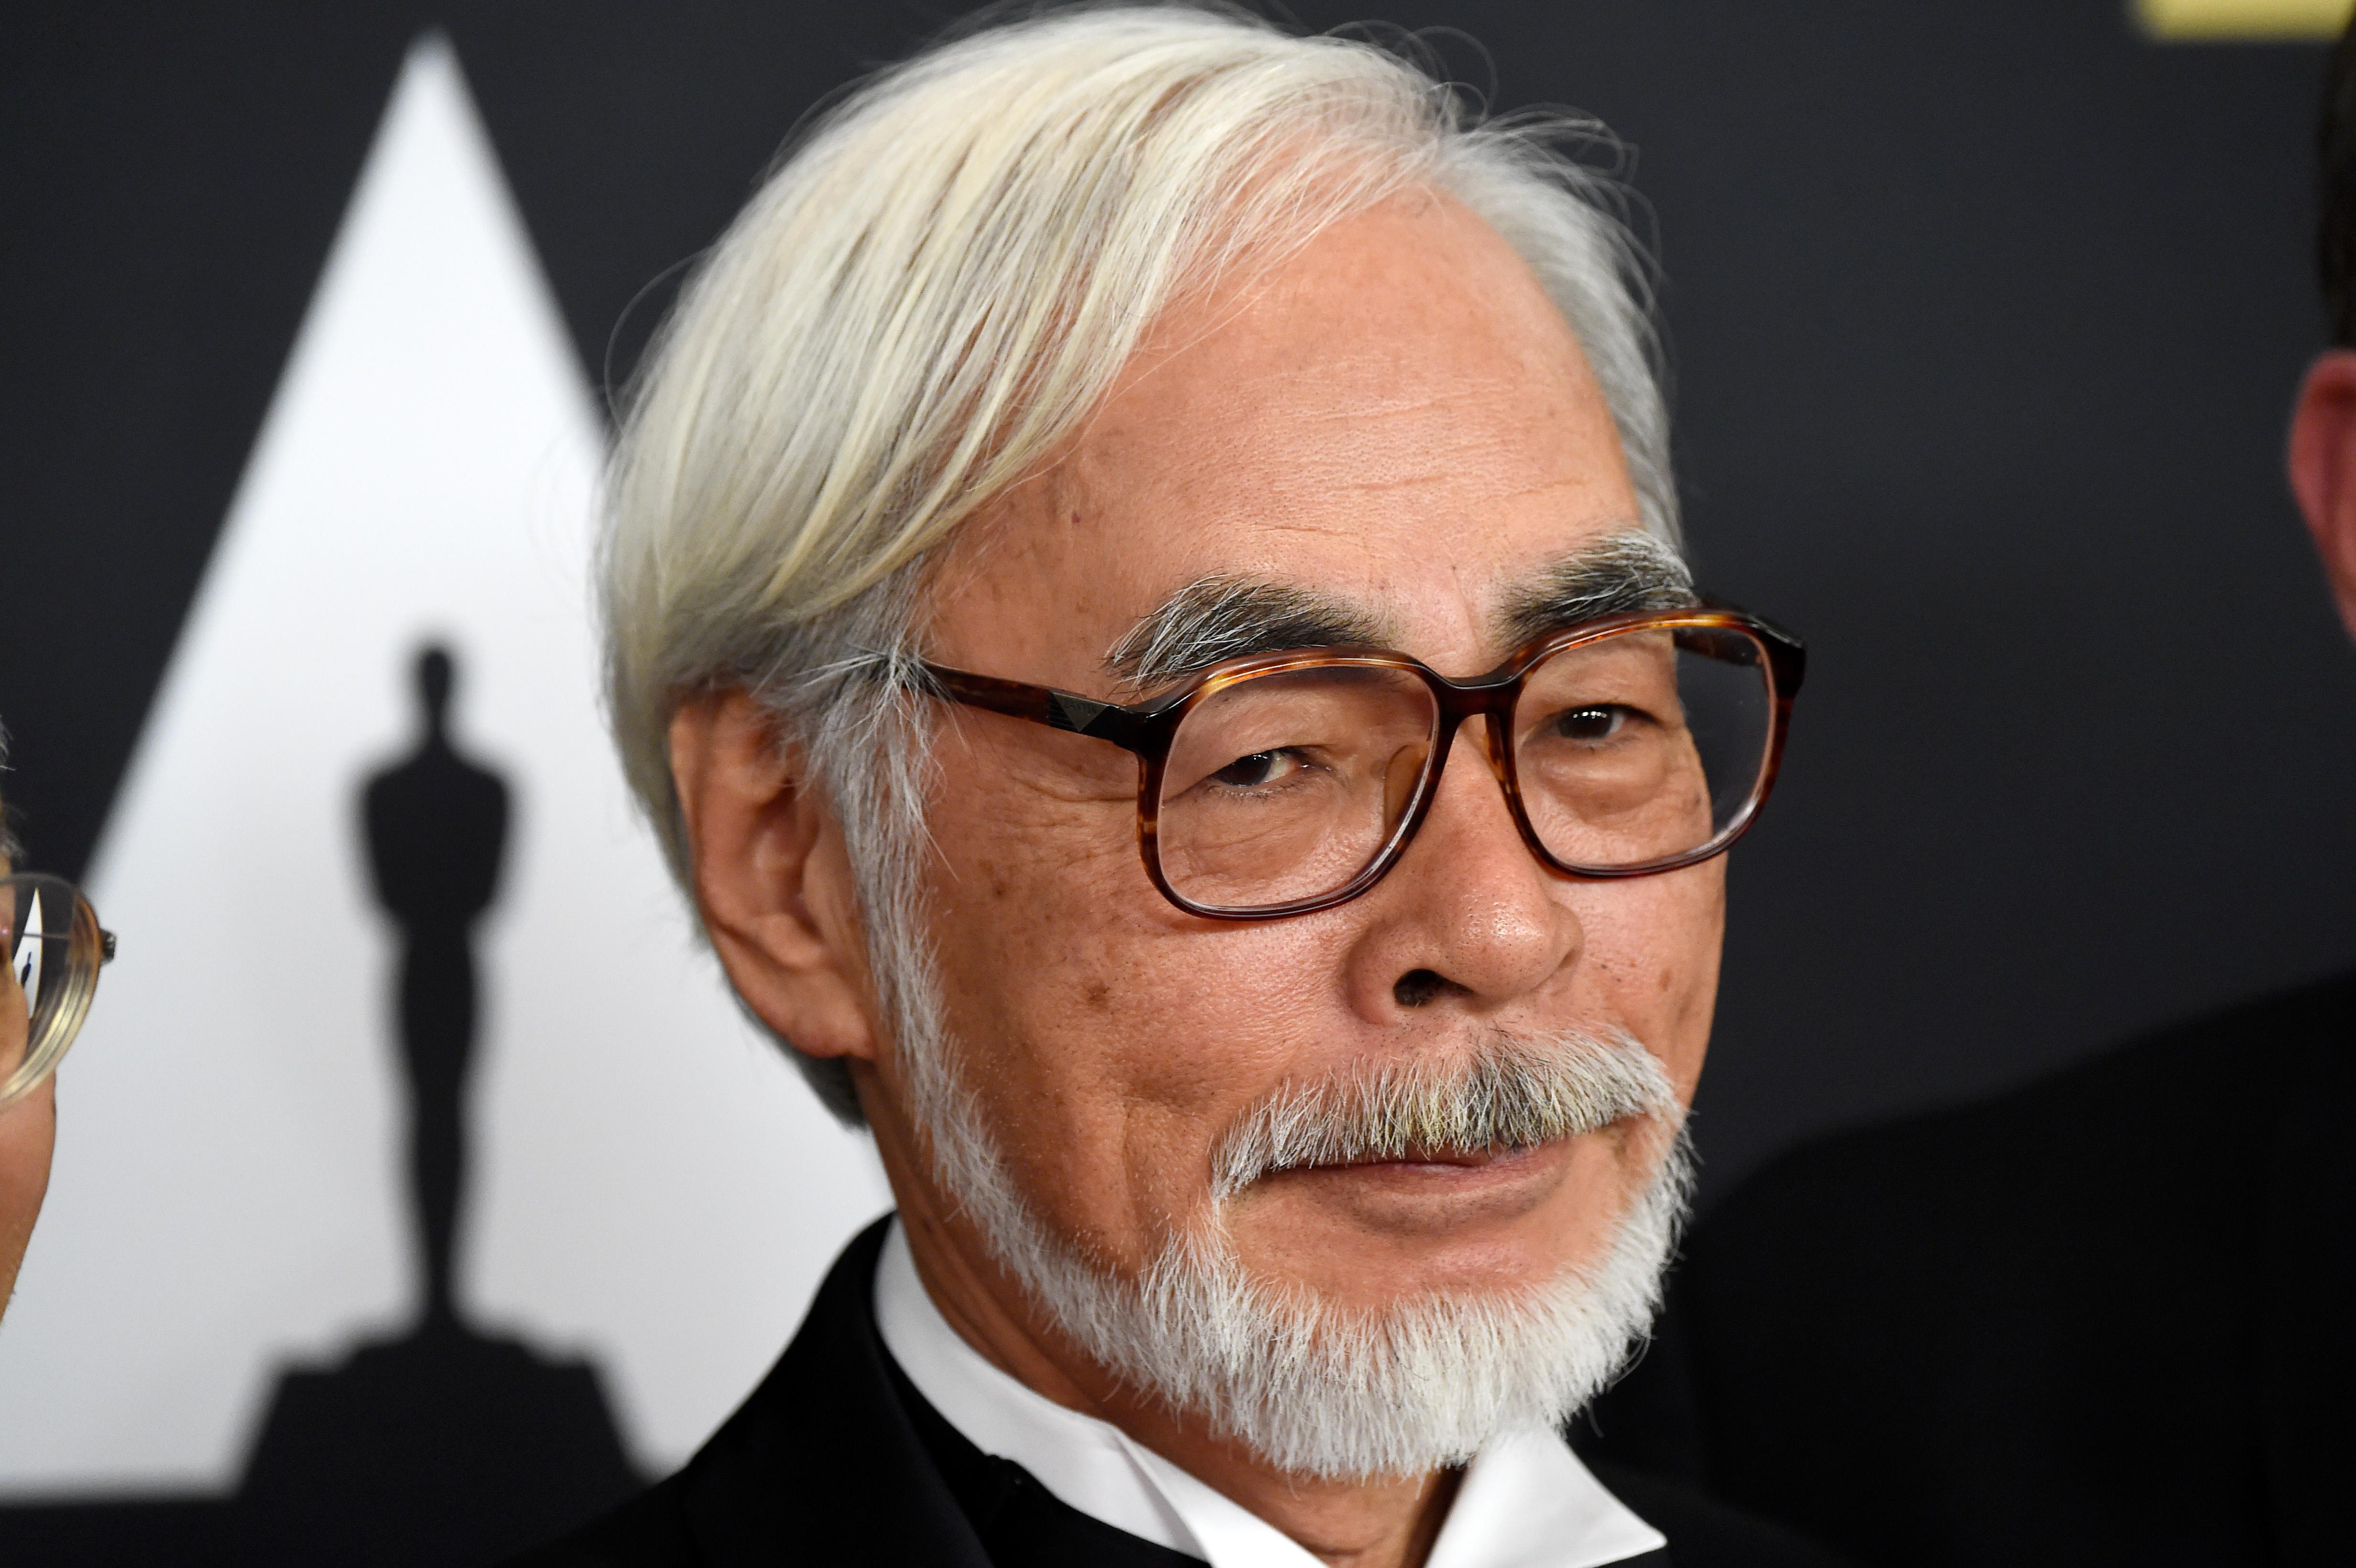 Hayao Miyazaki is officially moving forward with a new Studio Ghibli movie